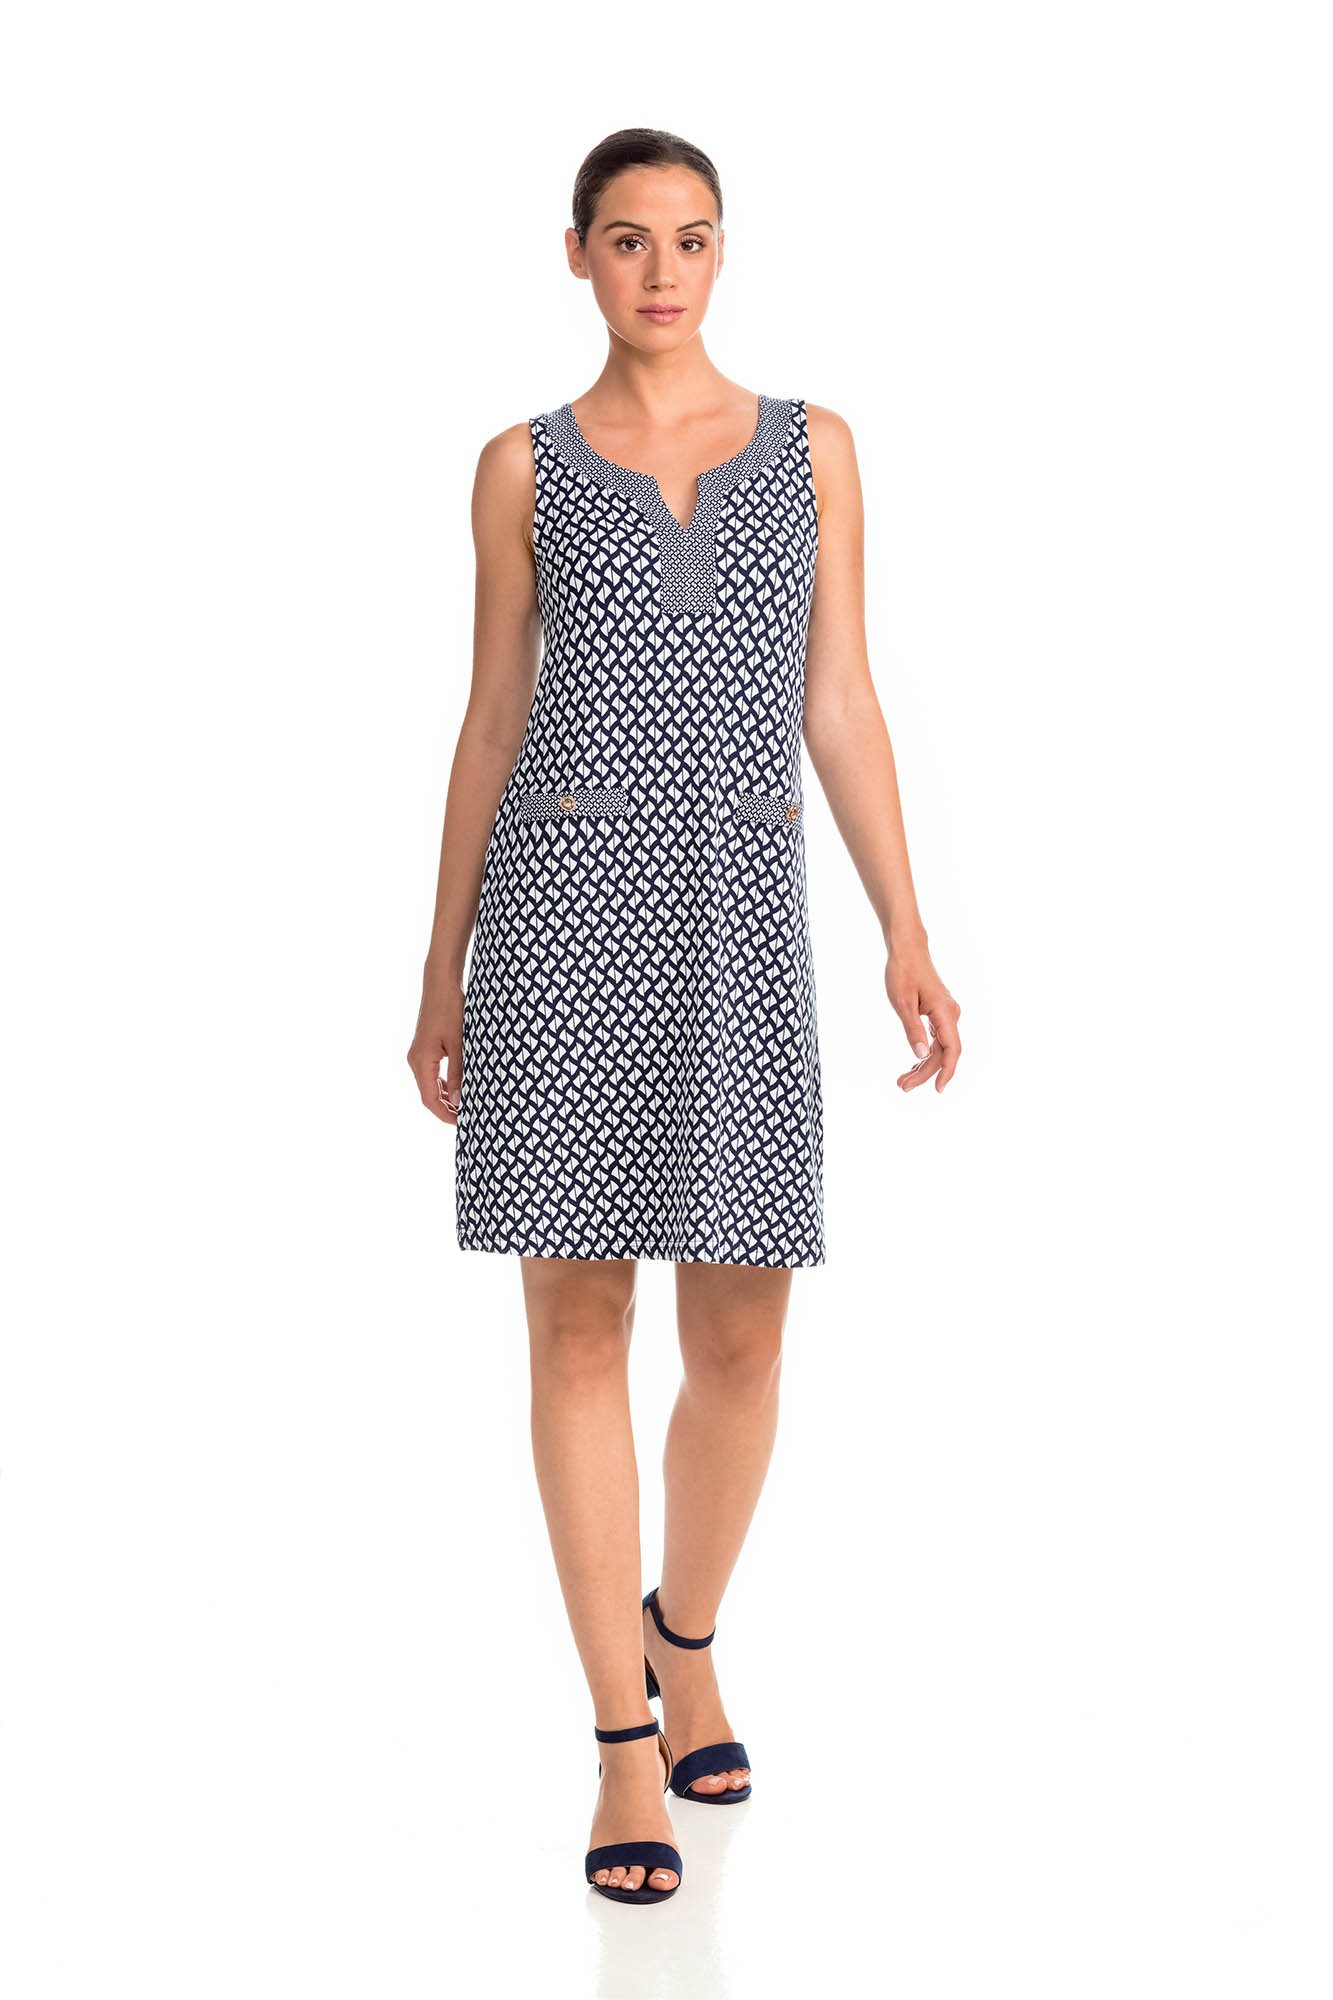 Vamp - Letné dámske šaty 14451 - Vamp blue xxl